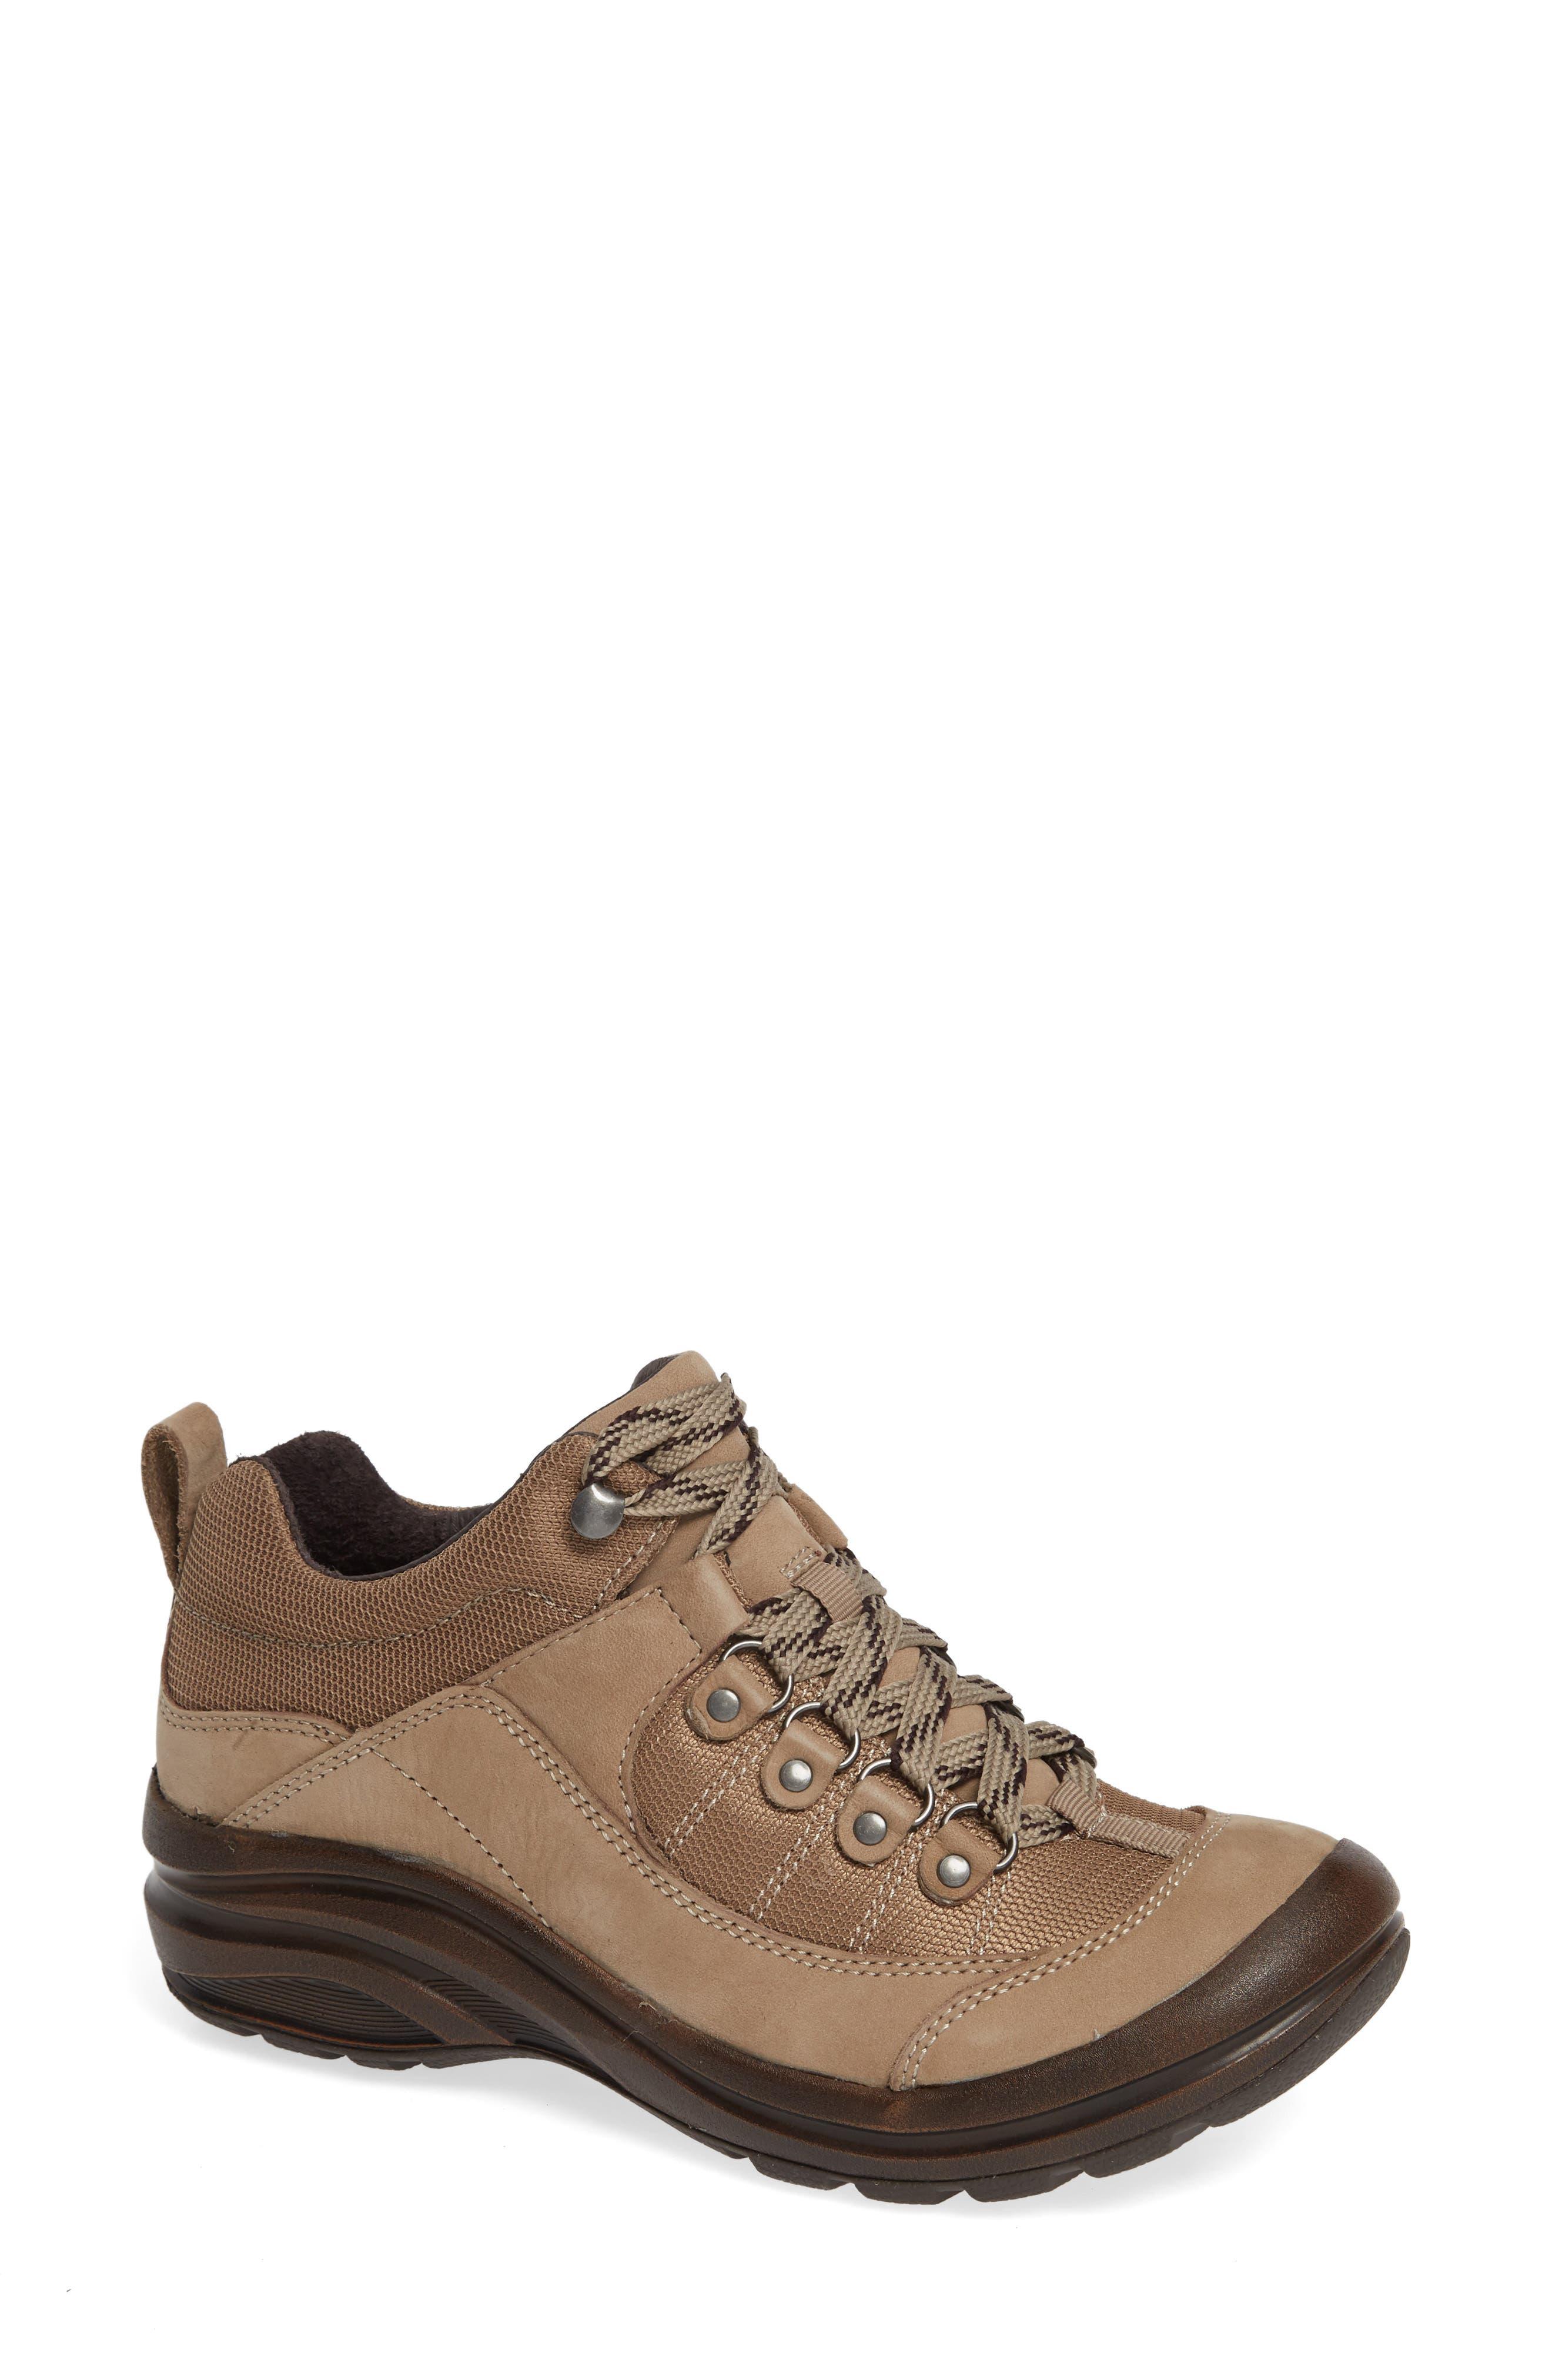 Bionica Milliston Waterproof Hiking Waterproof Boot- Beige